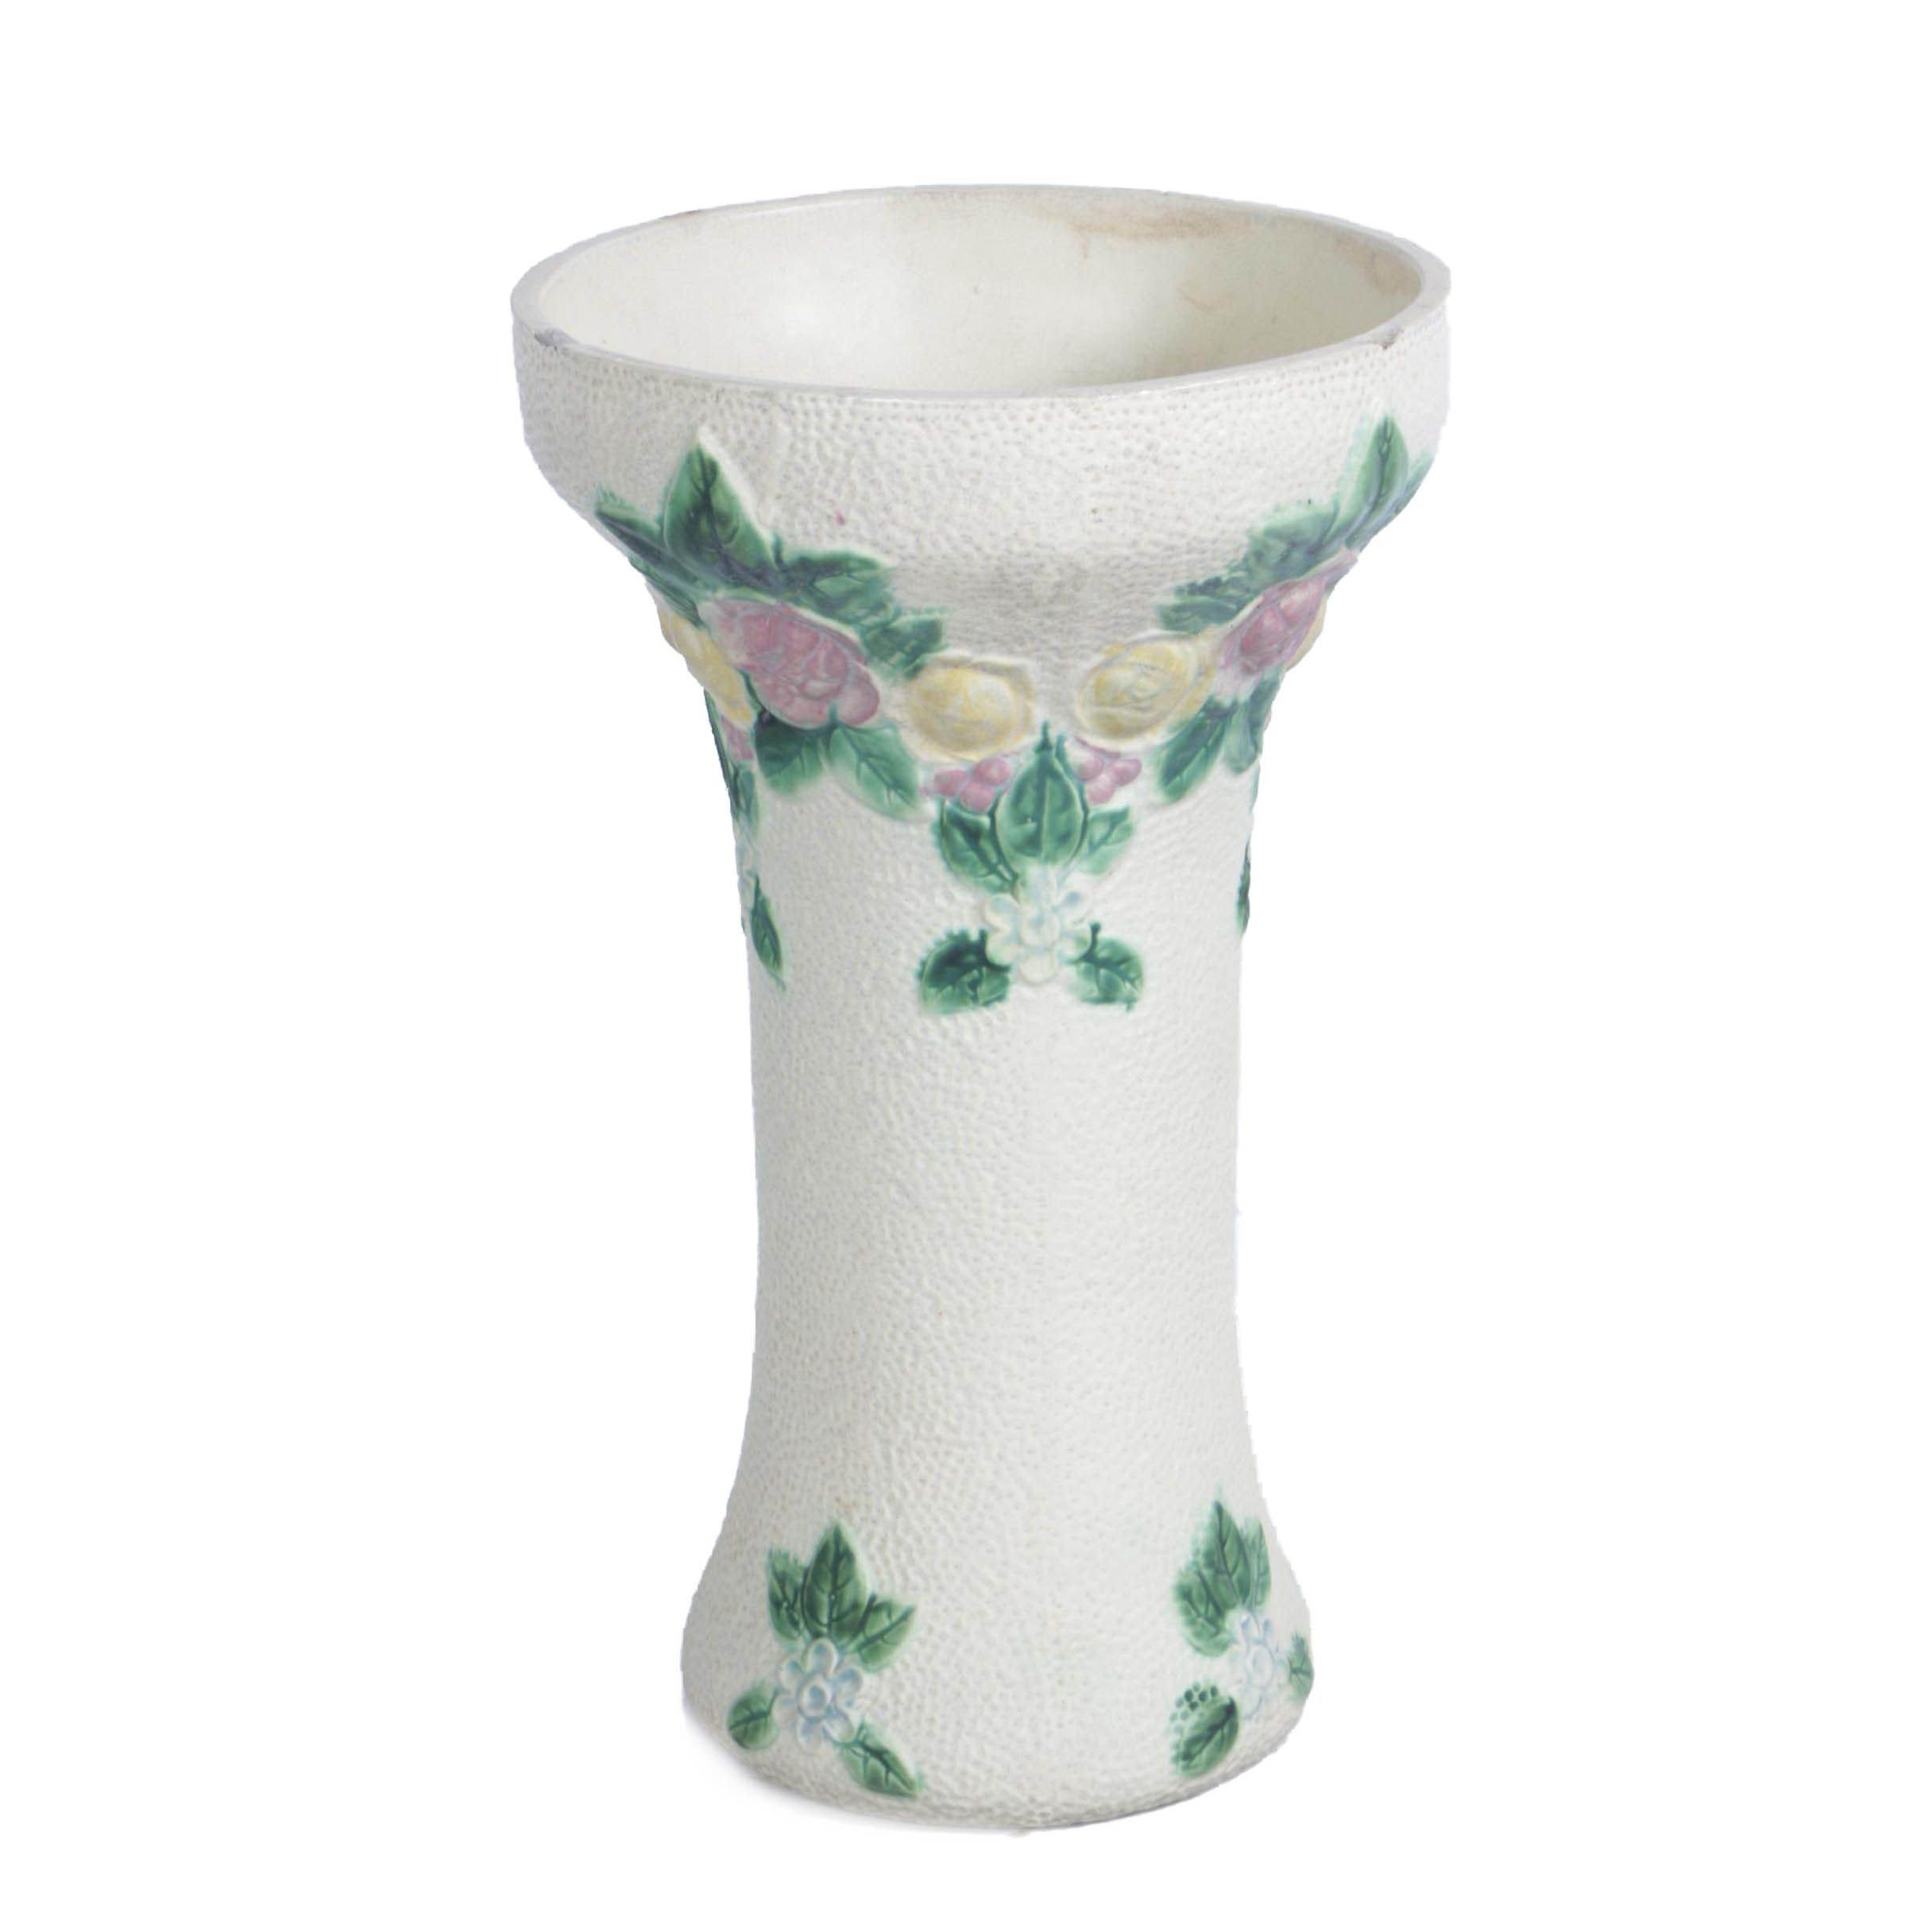 Vintage Ceramic Floral Umbrella Stand